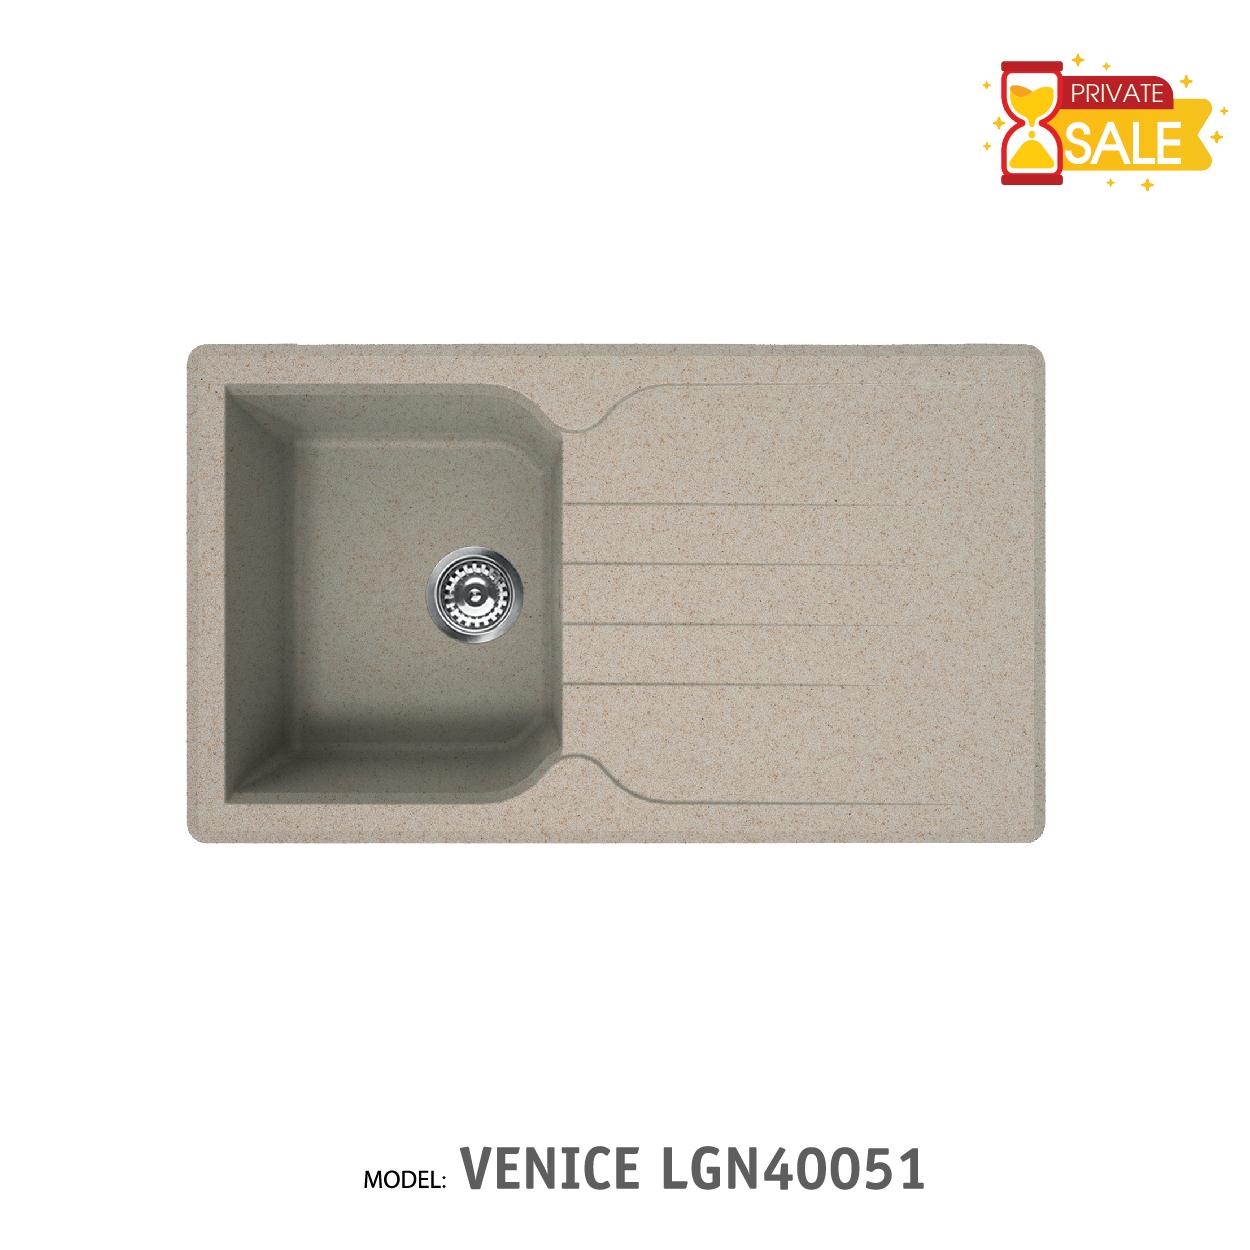 Chậu đá Birrilo - Model VENICE LGN40051